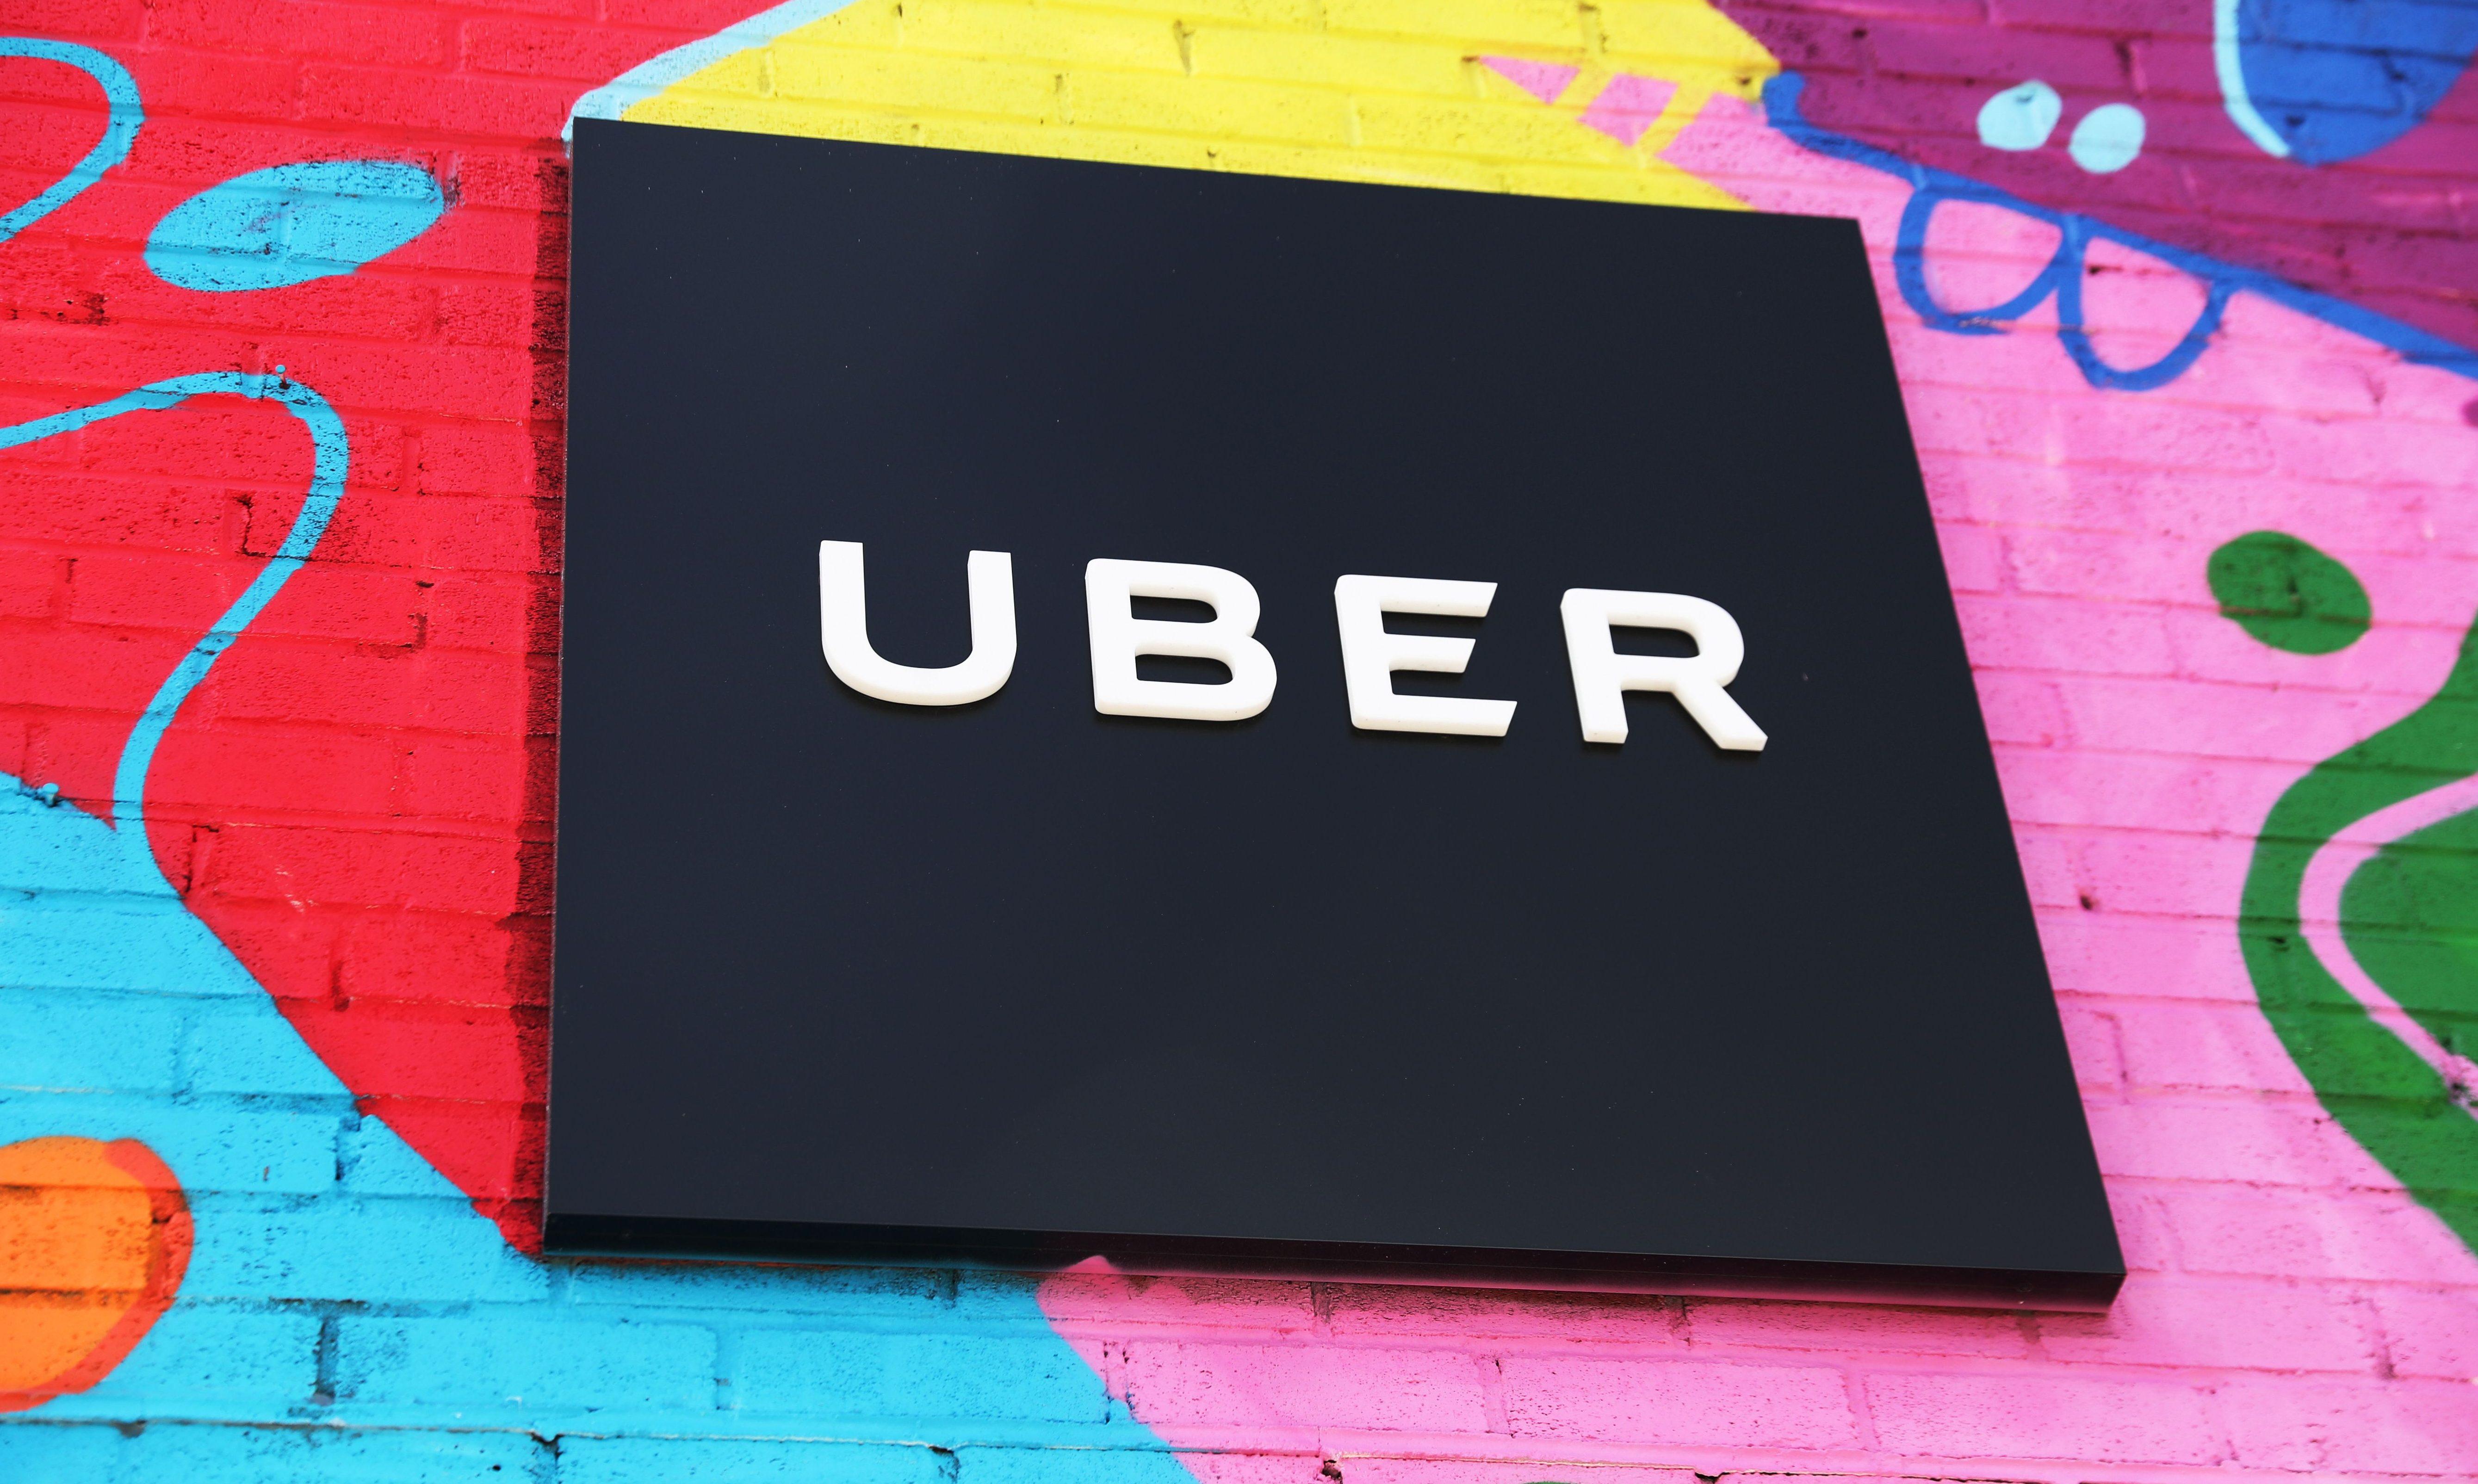 Uber's IPO